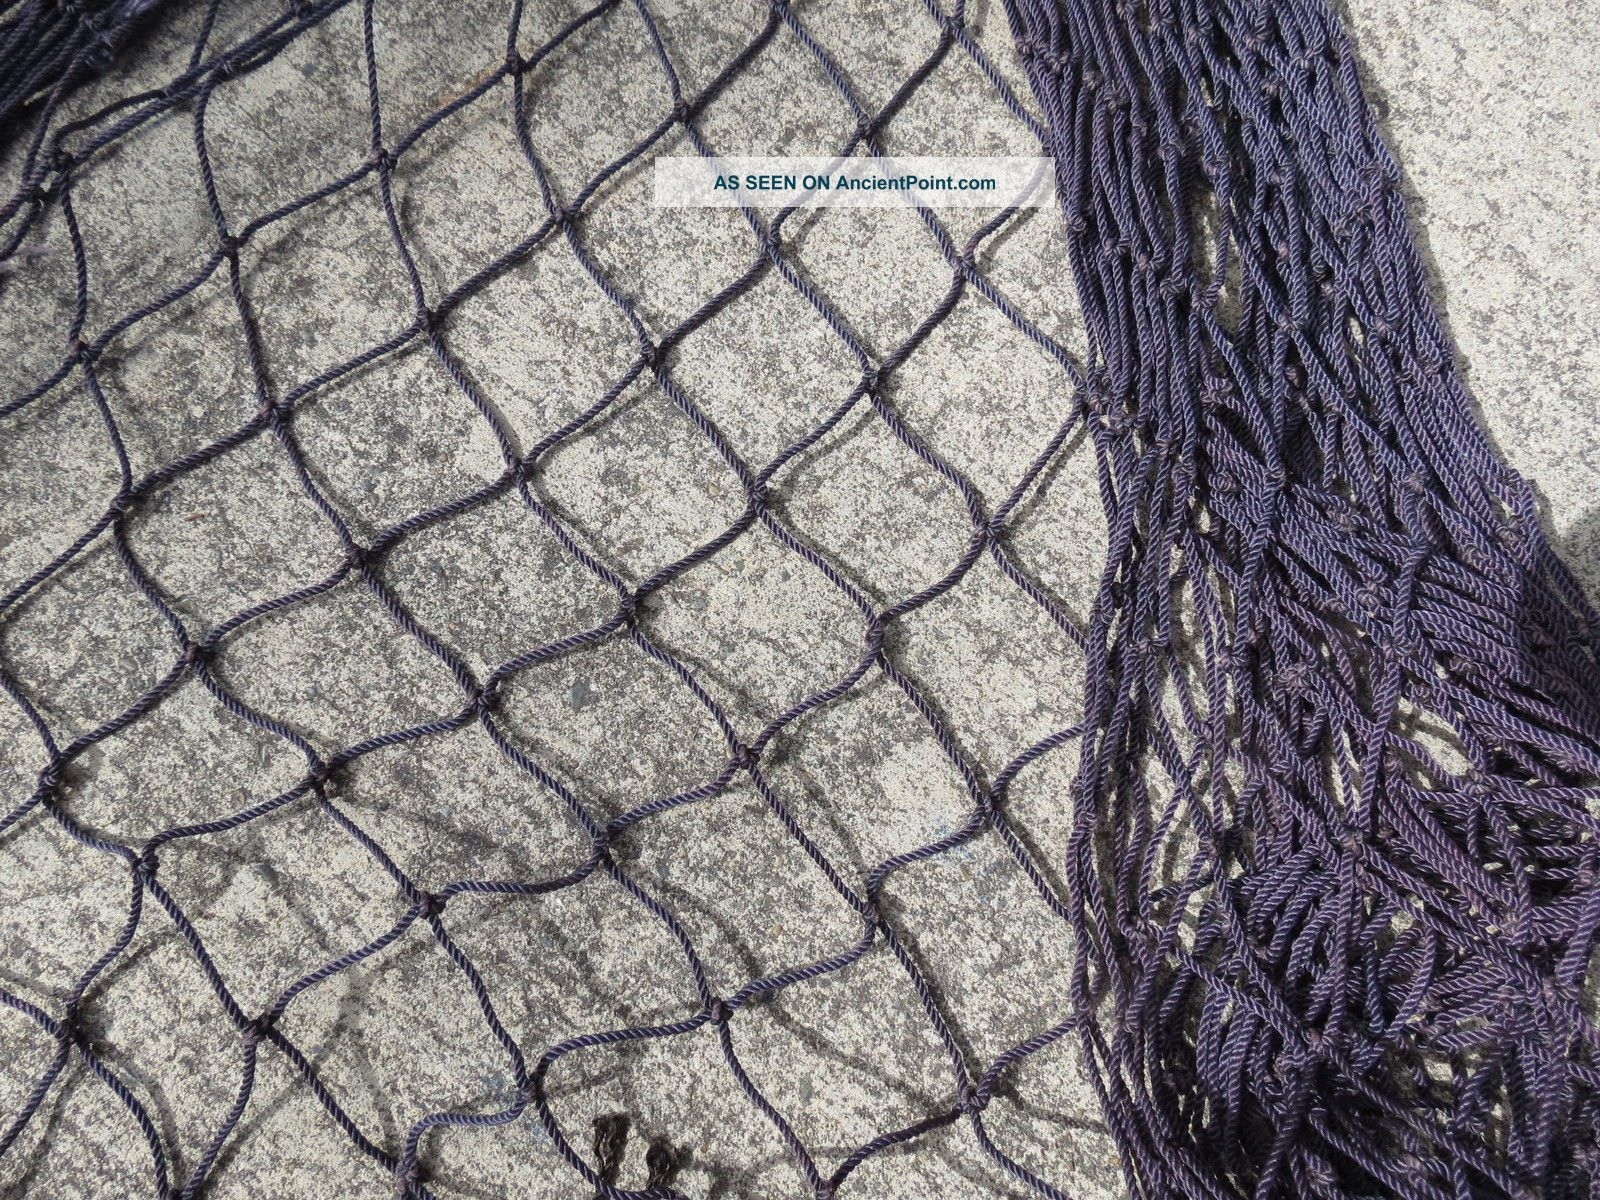 4 Feet X 8 Feet Purple Salmon Alaskan Seine Net Fishing Fish Netting (n278) Fishing Nets & Floats photo